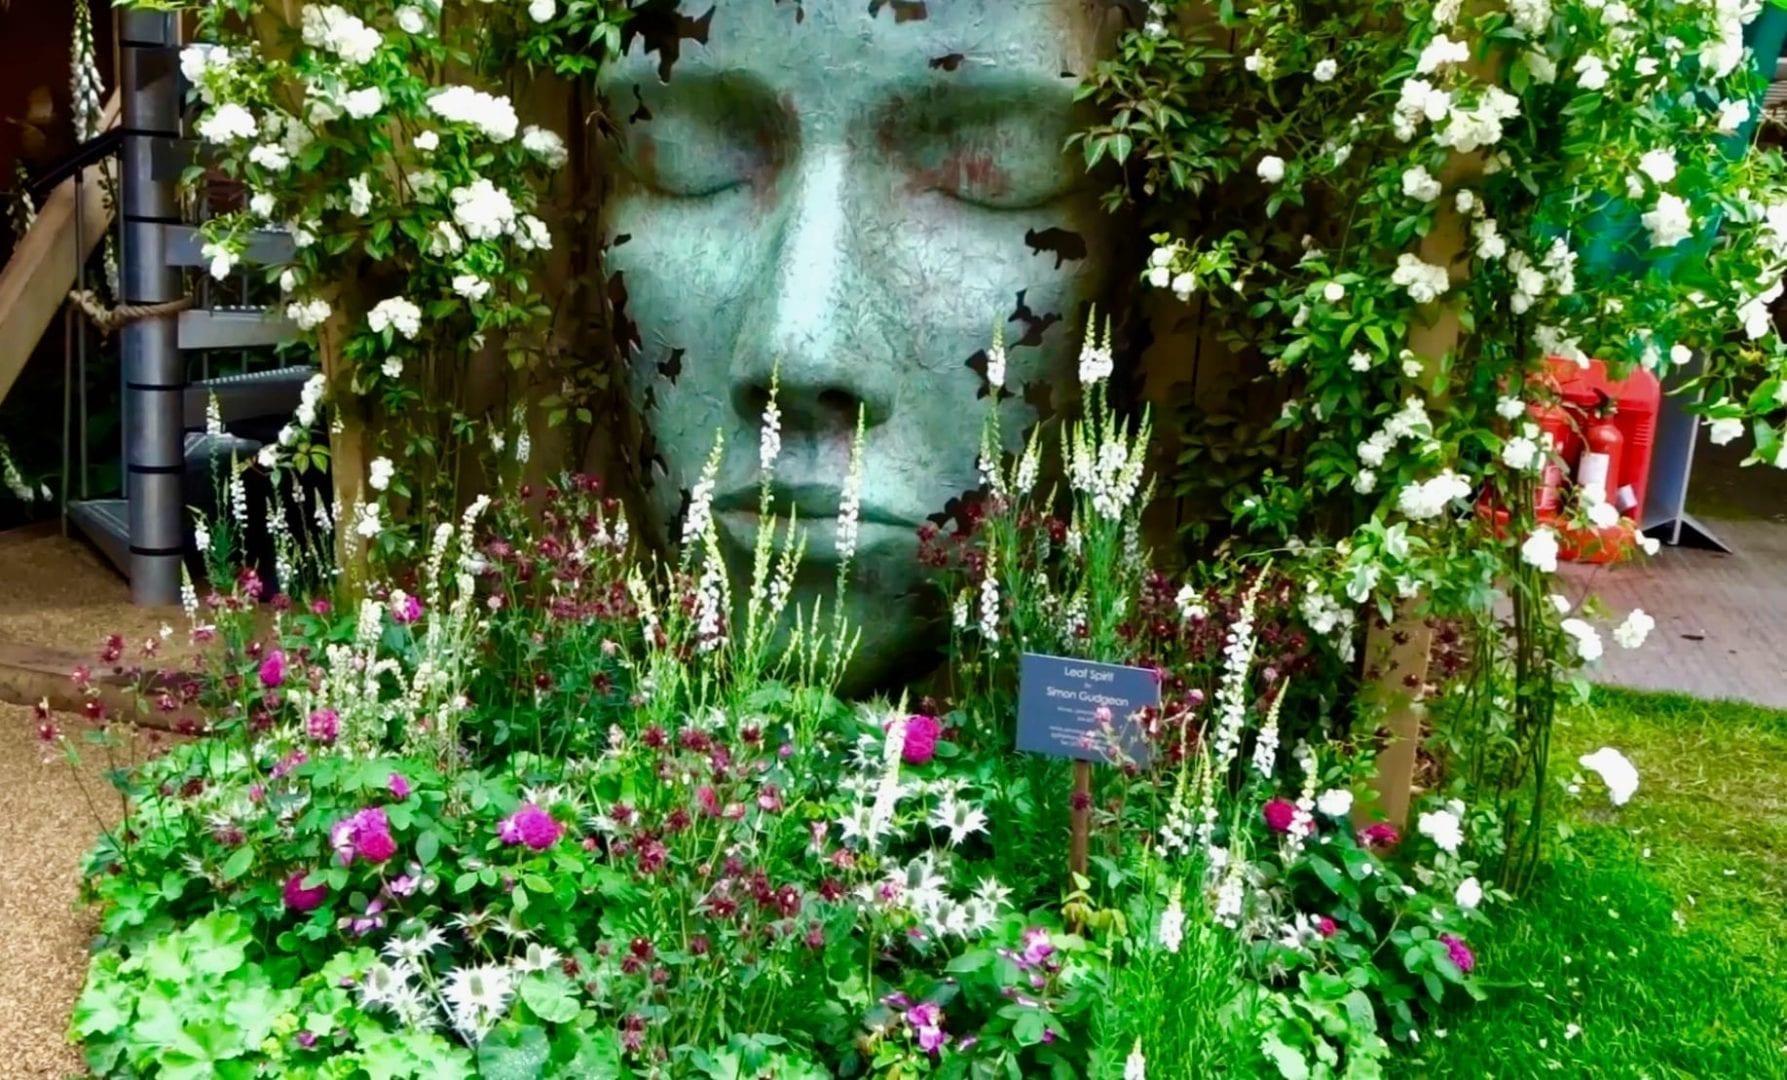 Chelsea Flower Show 2022 Dates